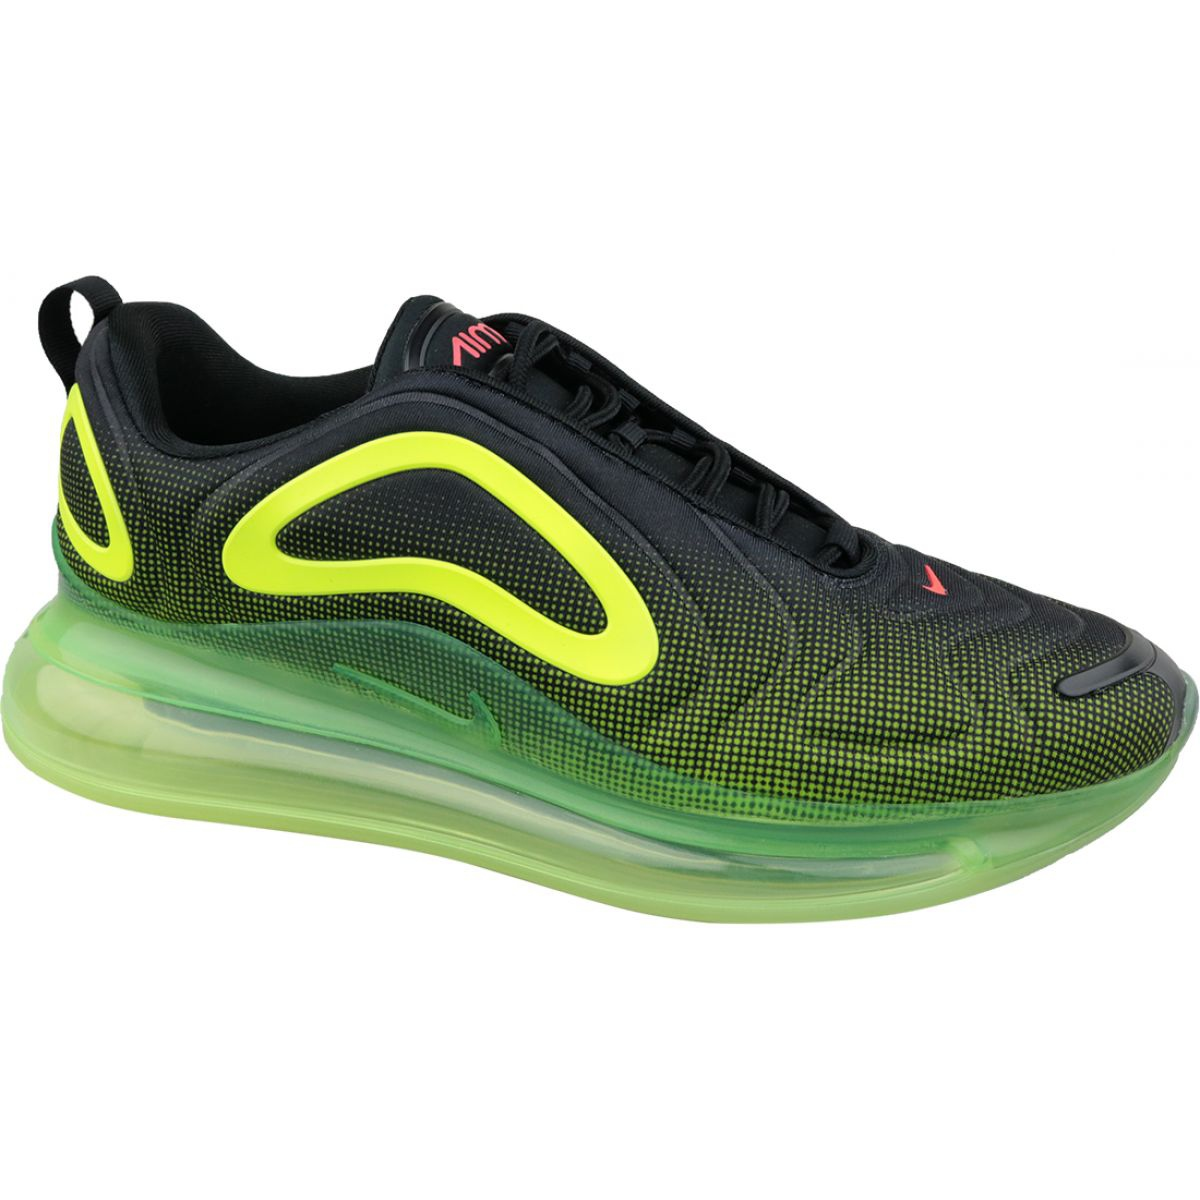 Noir Blanc Nike Air Max 90 Drapeau américain Independence Hommes Chaussures de formation 872634 985